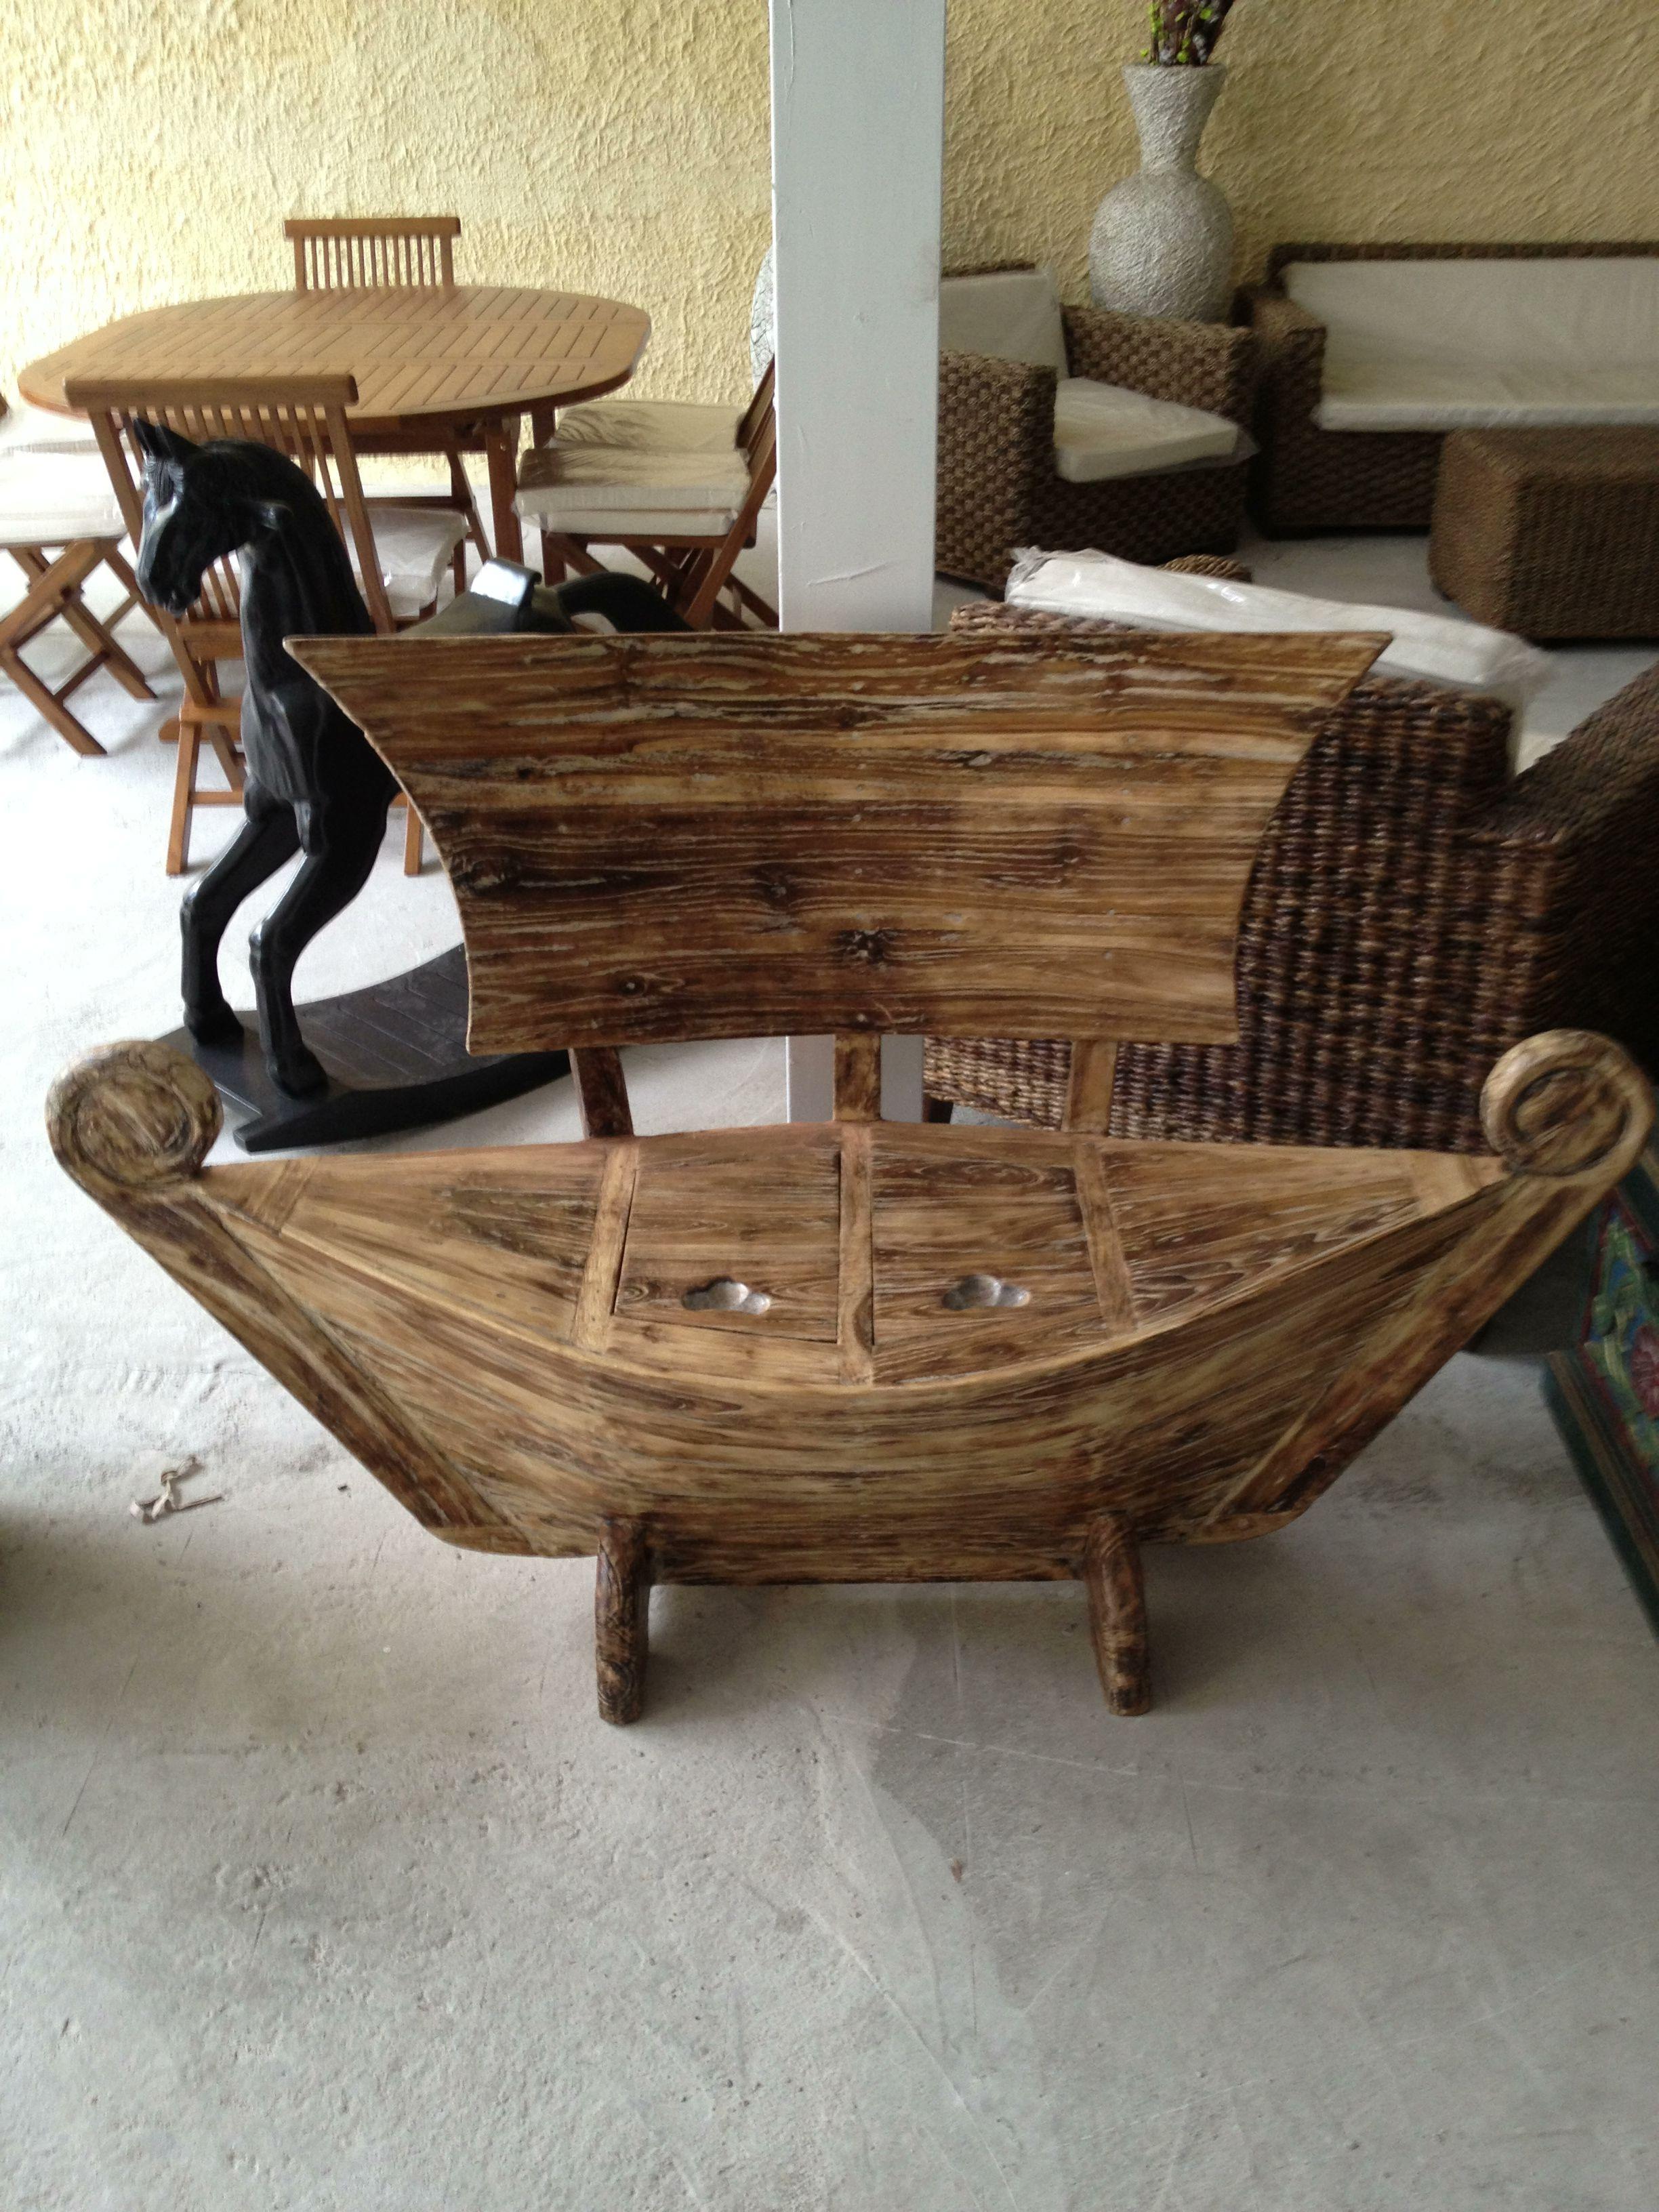 panca in legno con seduta contenitore antarte arredo On panca in legno con contenitore